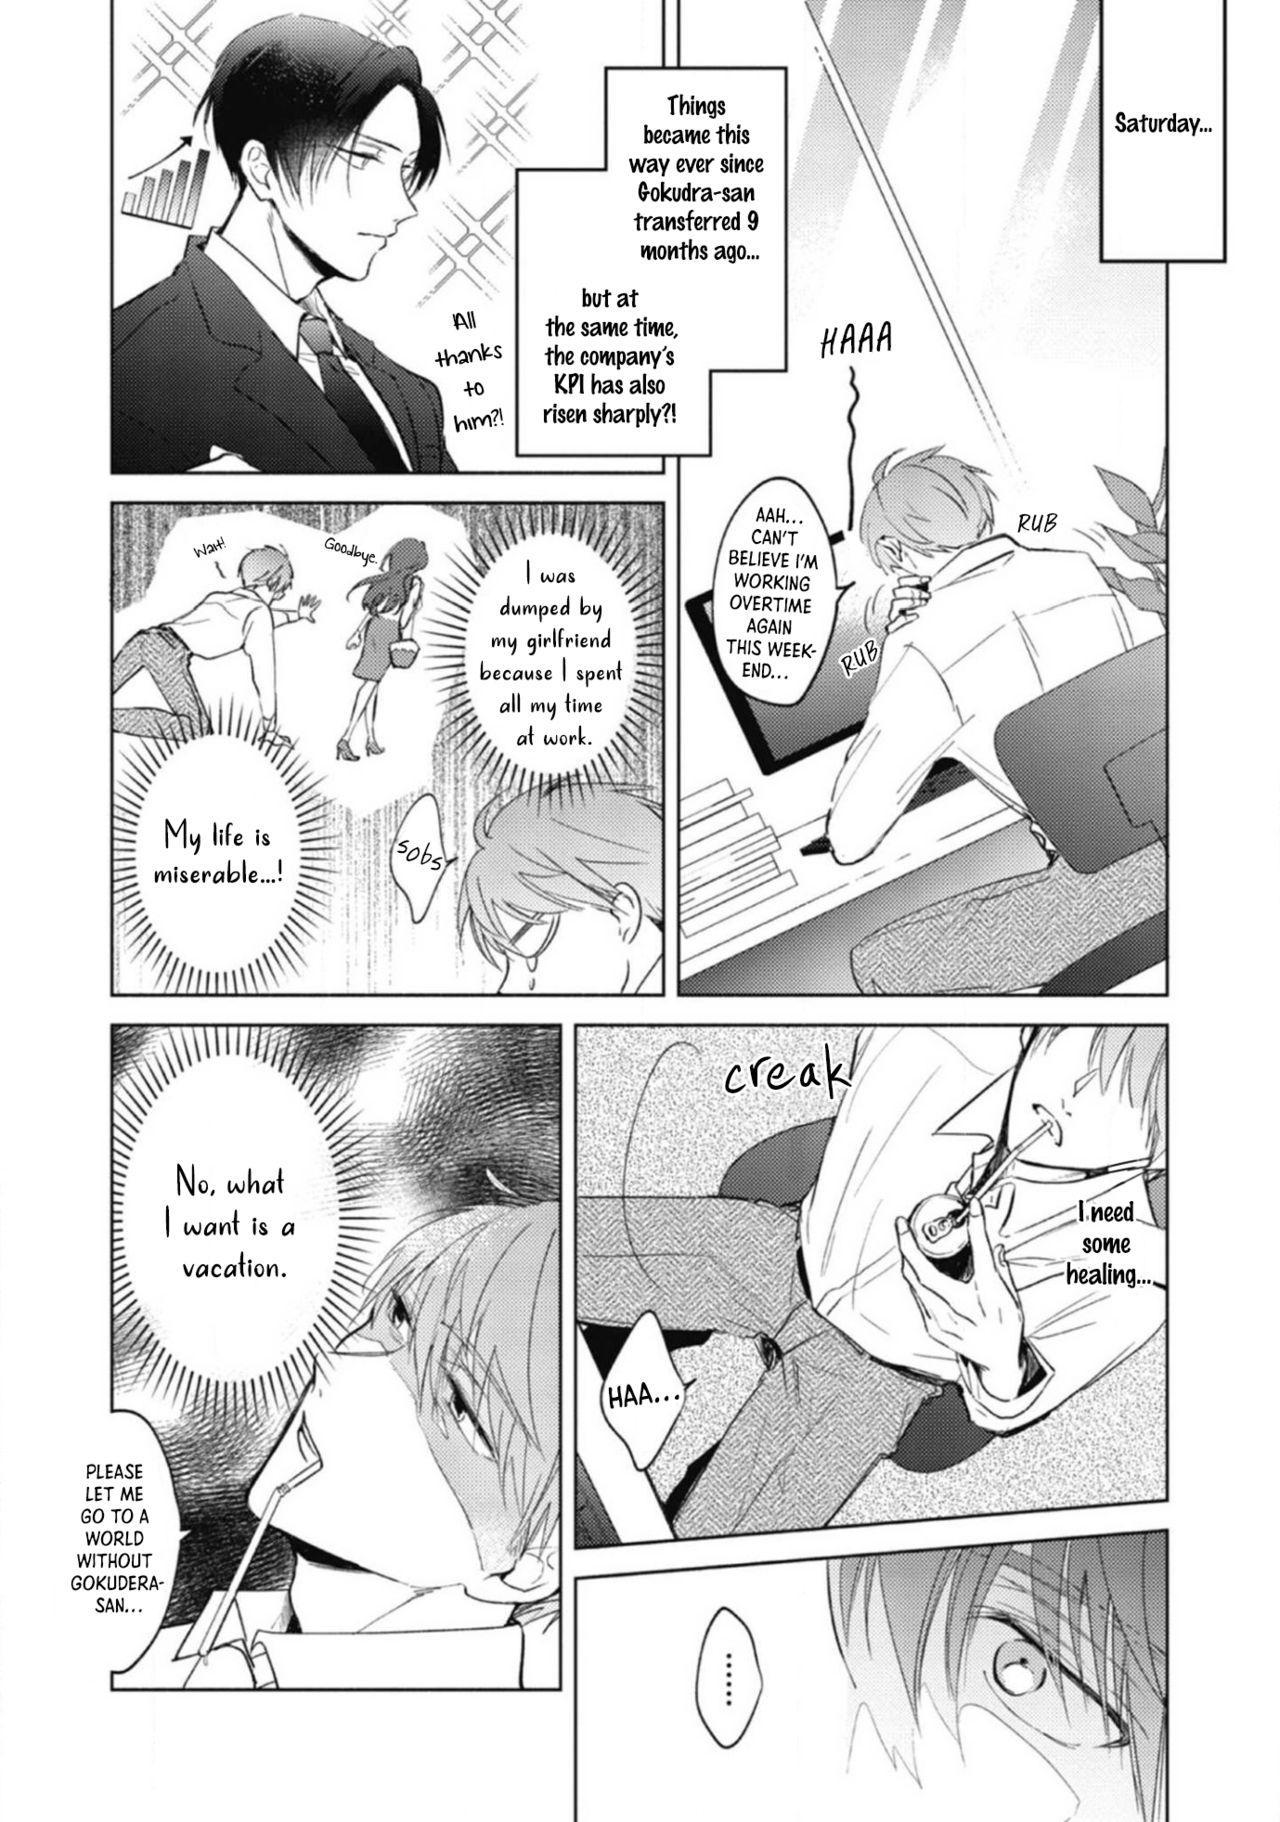 Oni Joushi Gokudera-san wa Abakaretai   My demon boss, Gokudera wants to be exposed 1 10